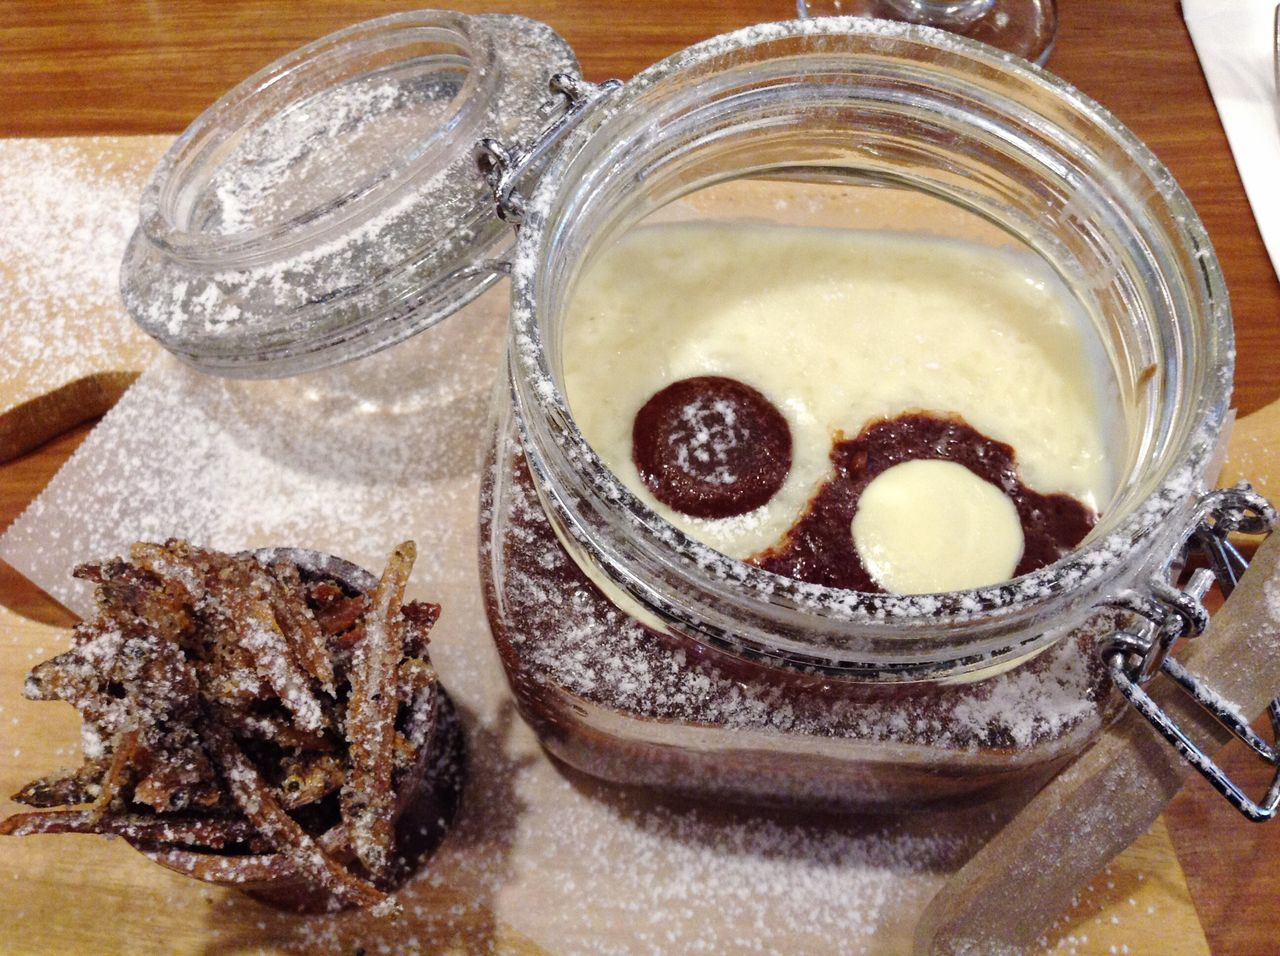 Yinyang Champorado Breakfast Yummy Chocolate Dilis Jar Close-up Table Temptation Sweet Food